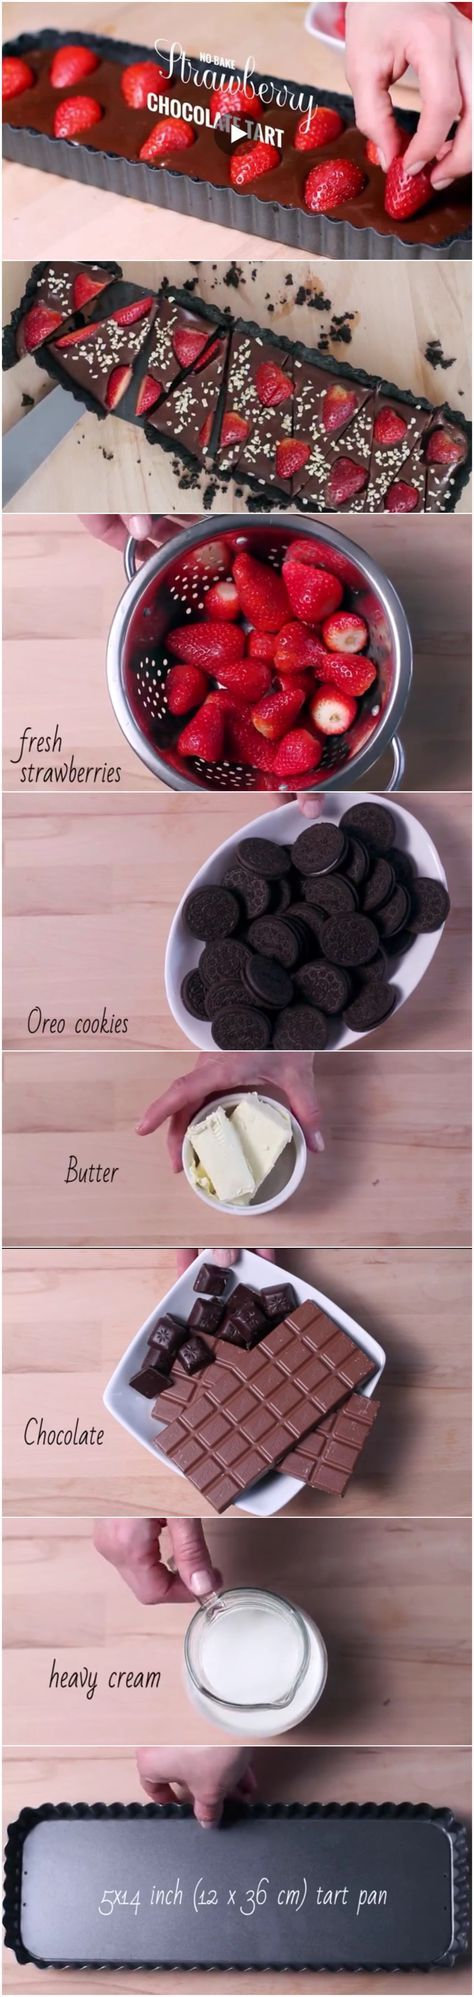 Easy no-bake Strawberry Chocolate tart